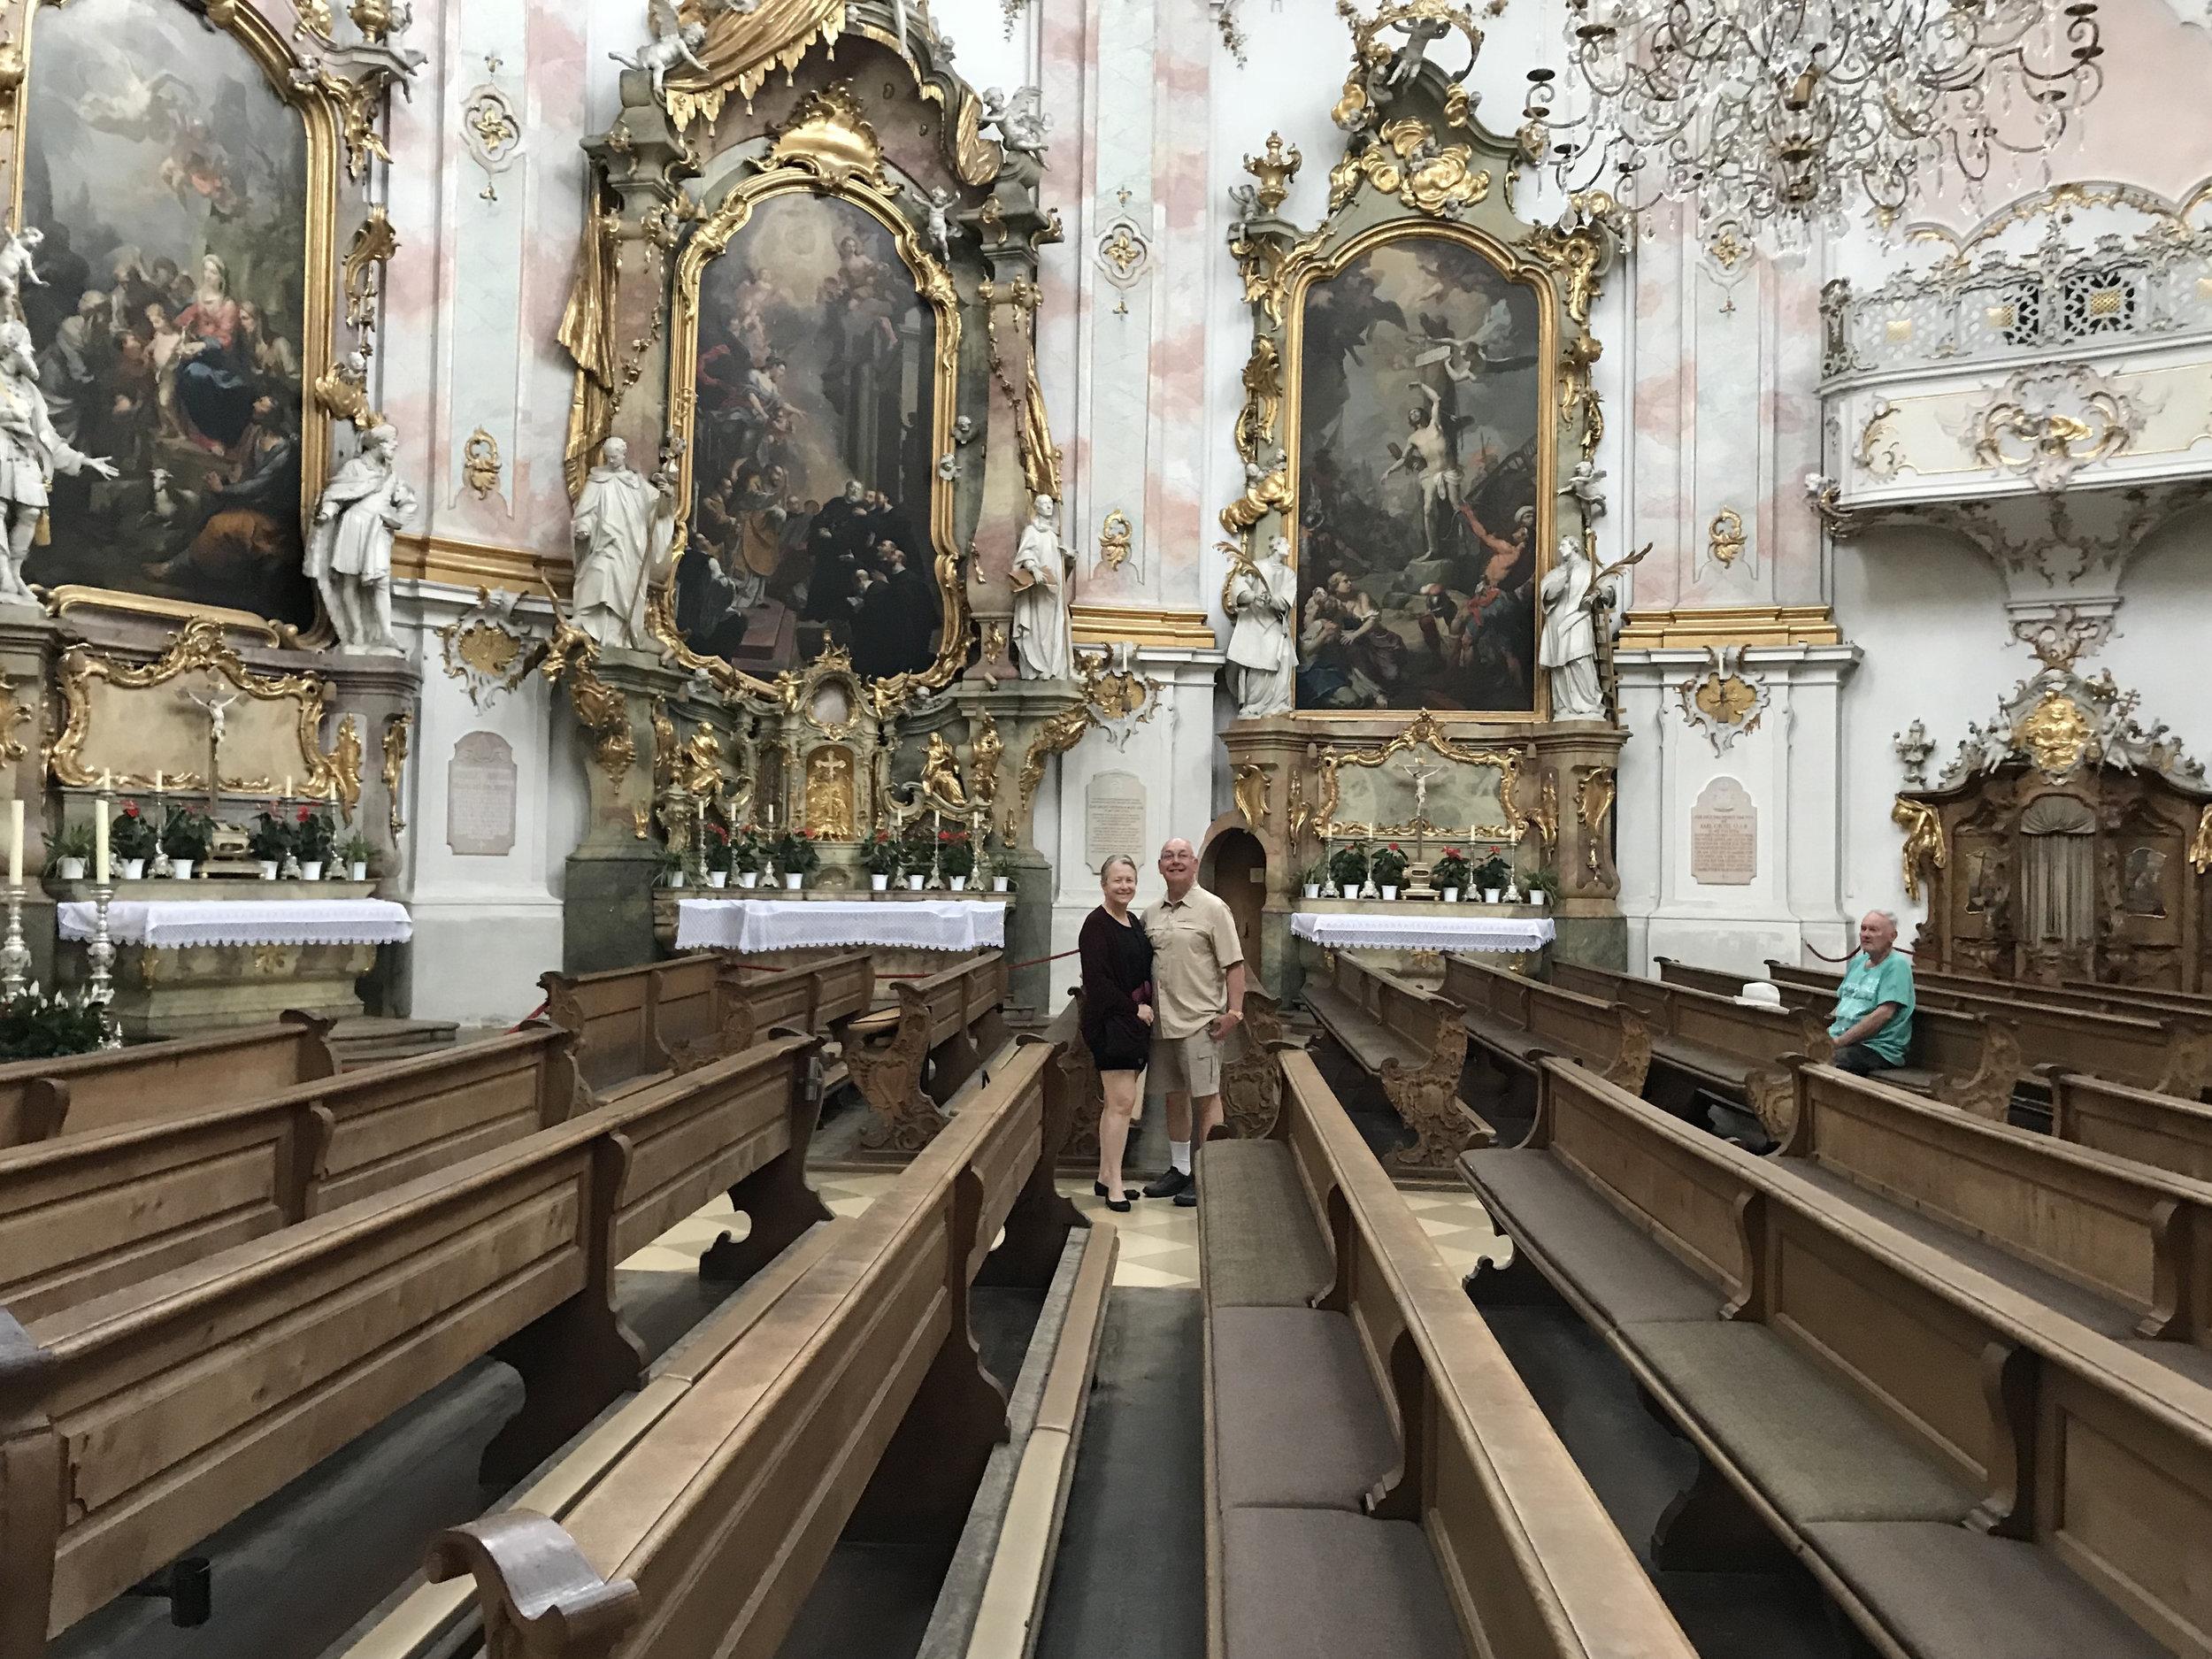 Teri_Bavaria_part3_monastery_spiritedtable_photo22.jpg